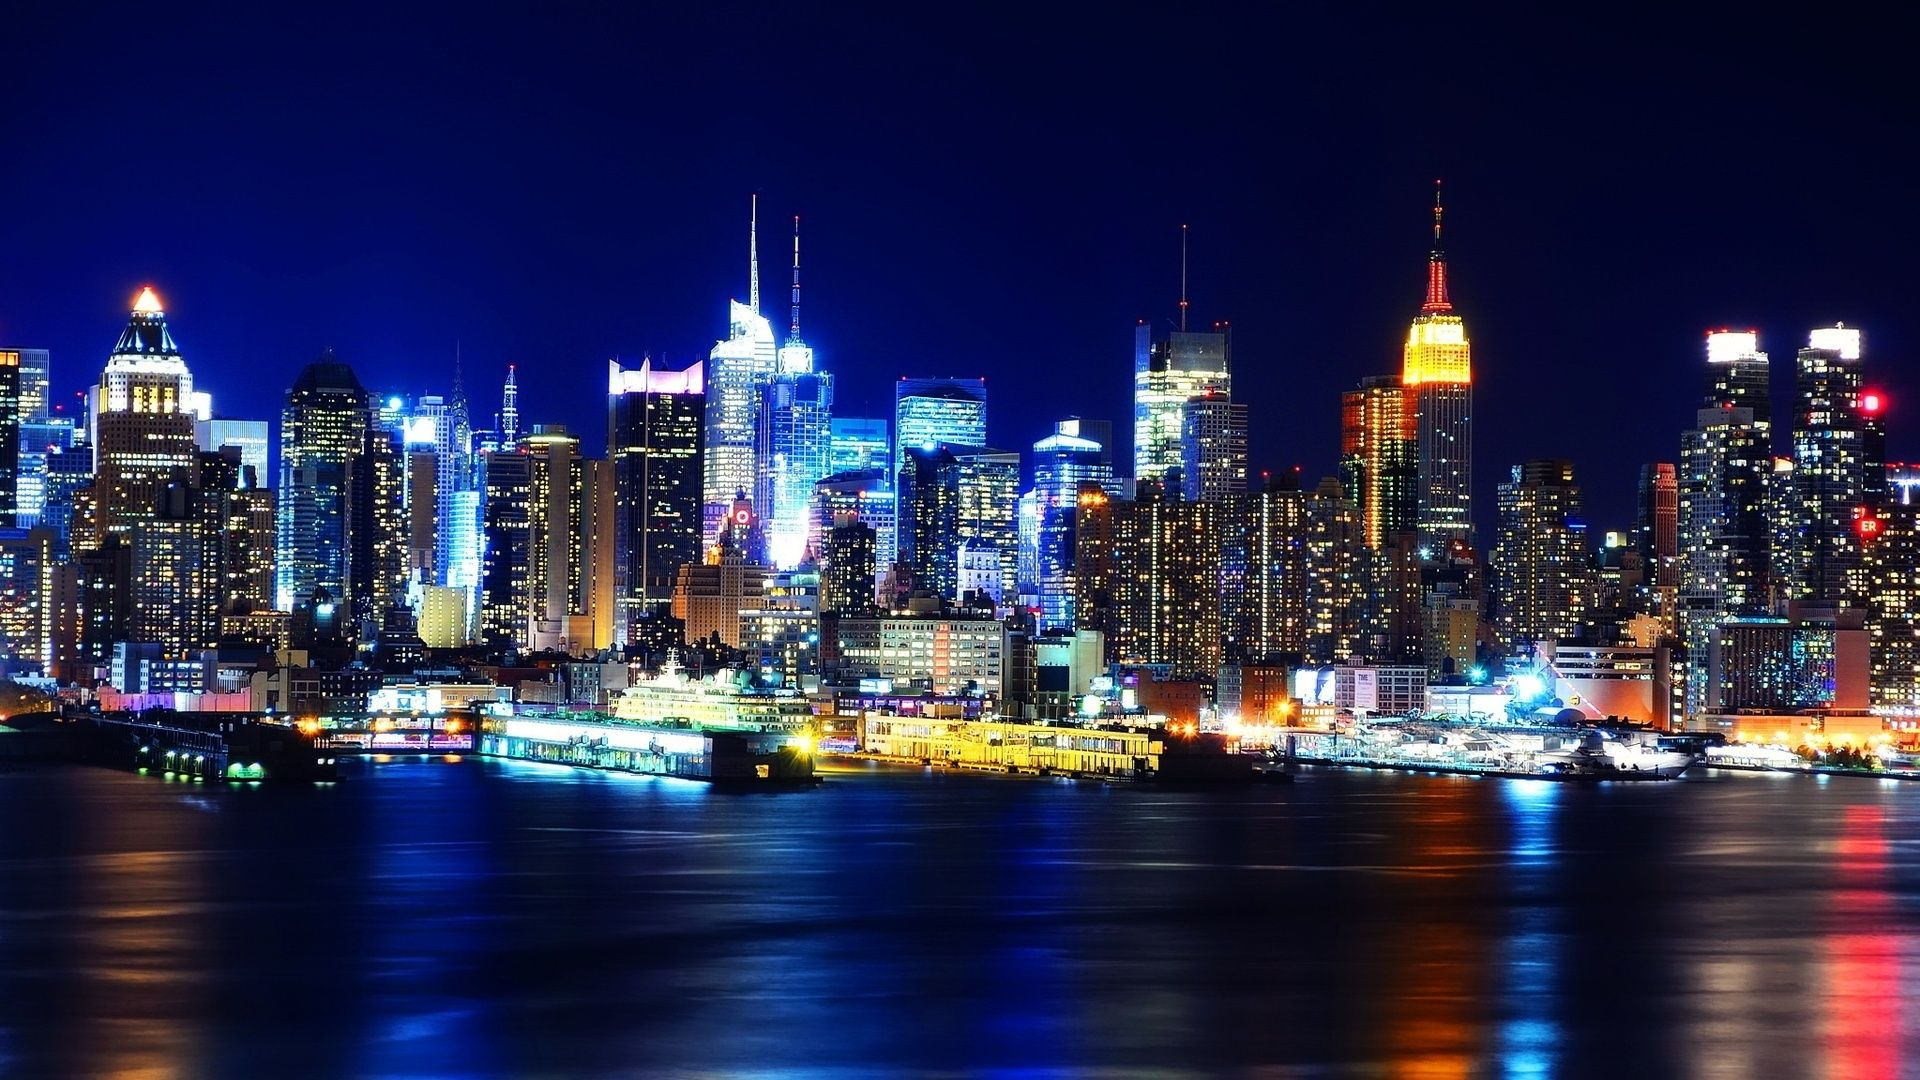 new york city at night free wallpaper i hd images | hd wallpapers